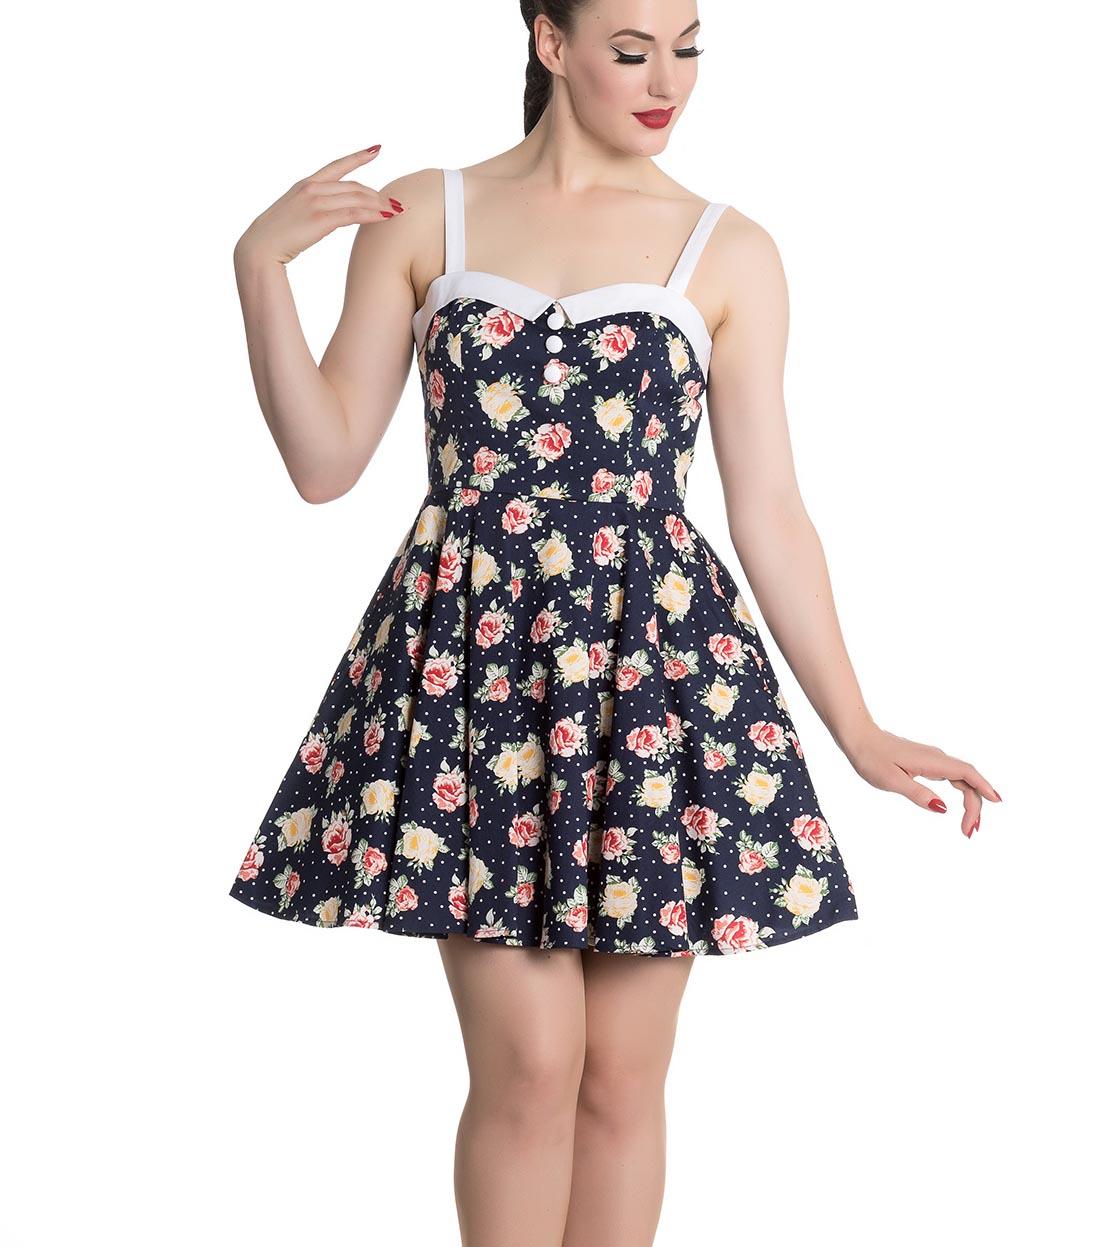 Hell-Bunny-Navy-Blue-Floral-Roses-Flowers-Mini-Dress-EMMA-Polka-Dot-All-Sizes thumbnail 3